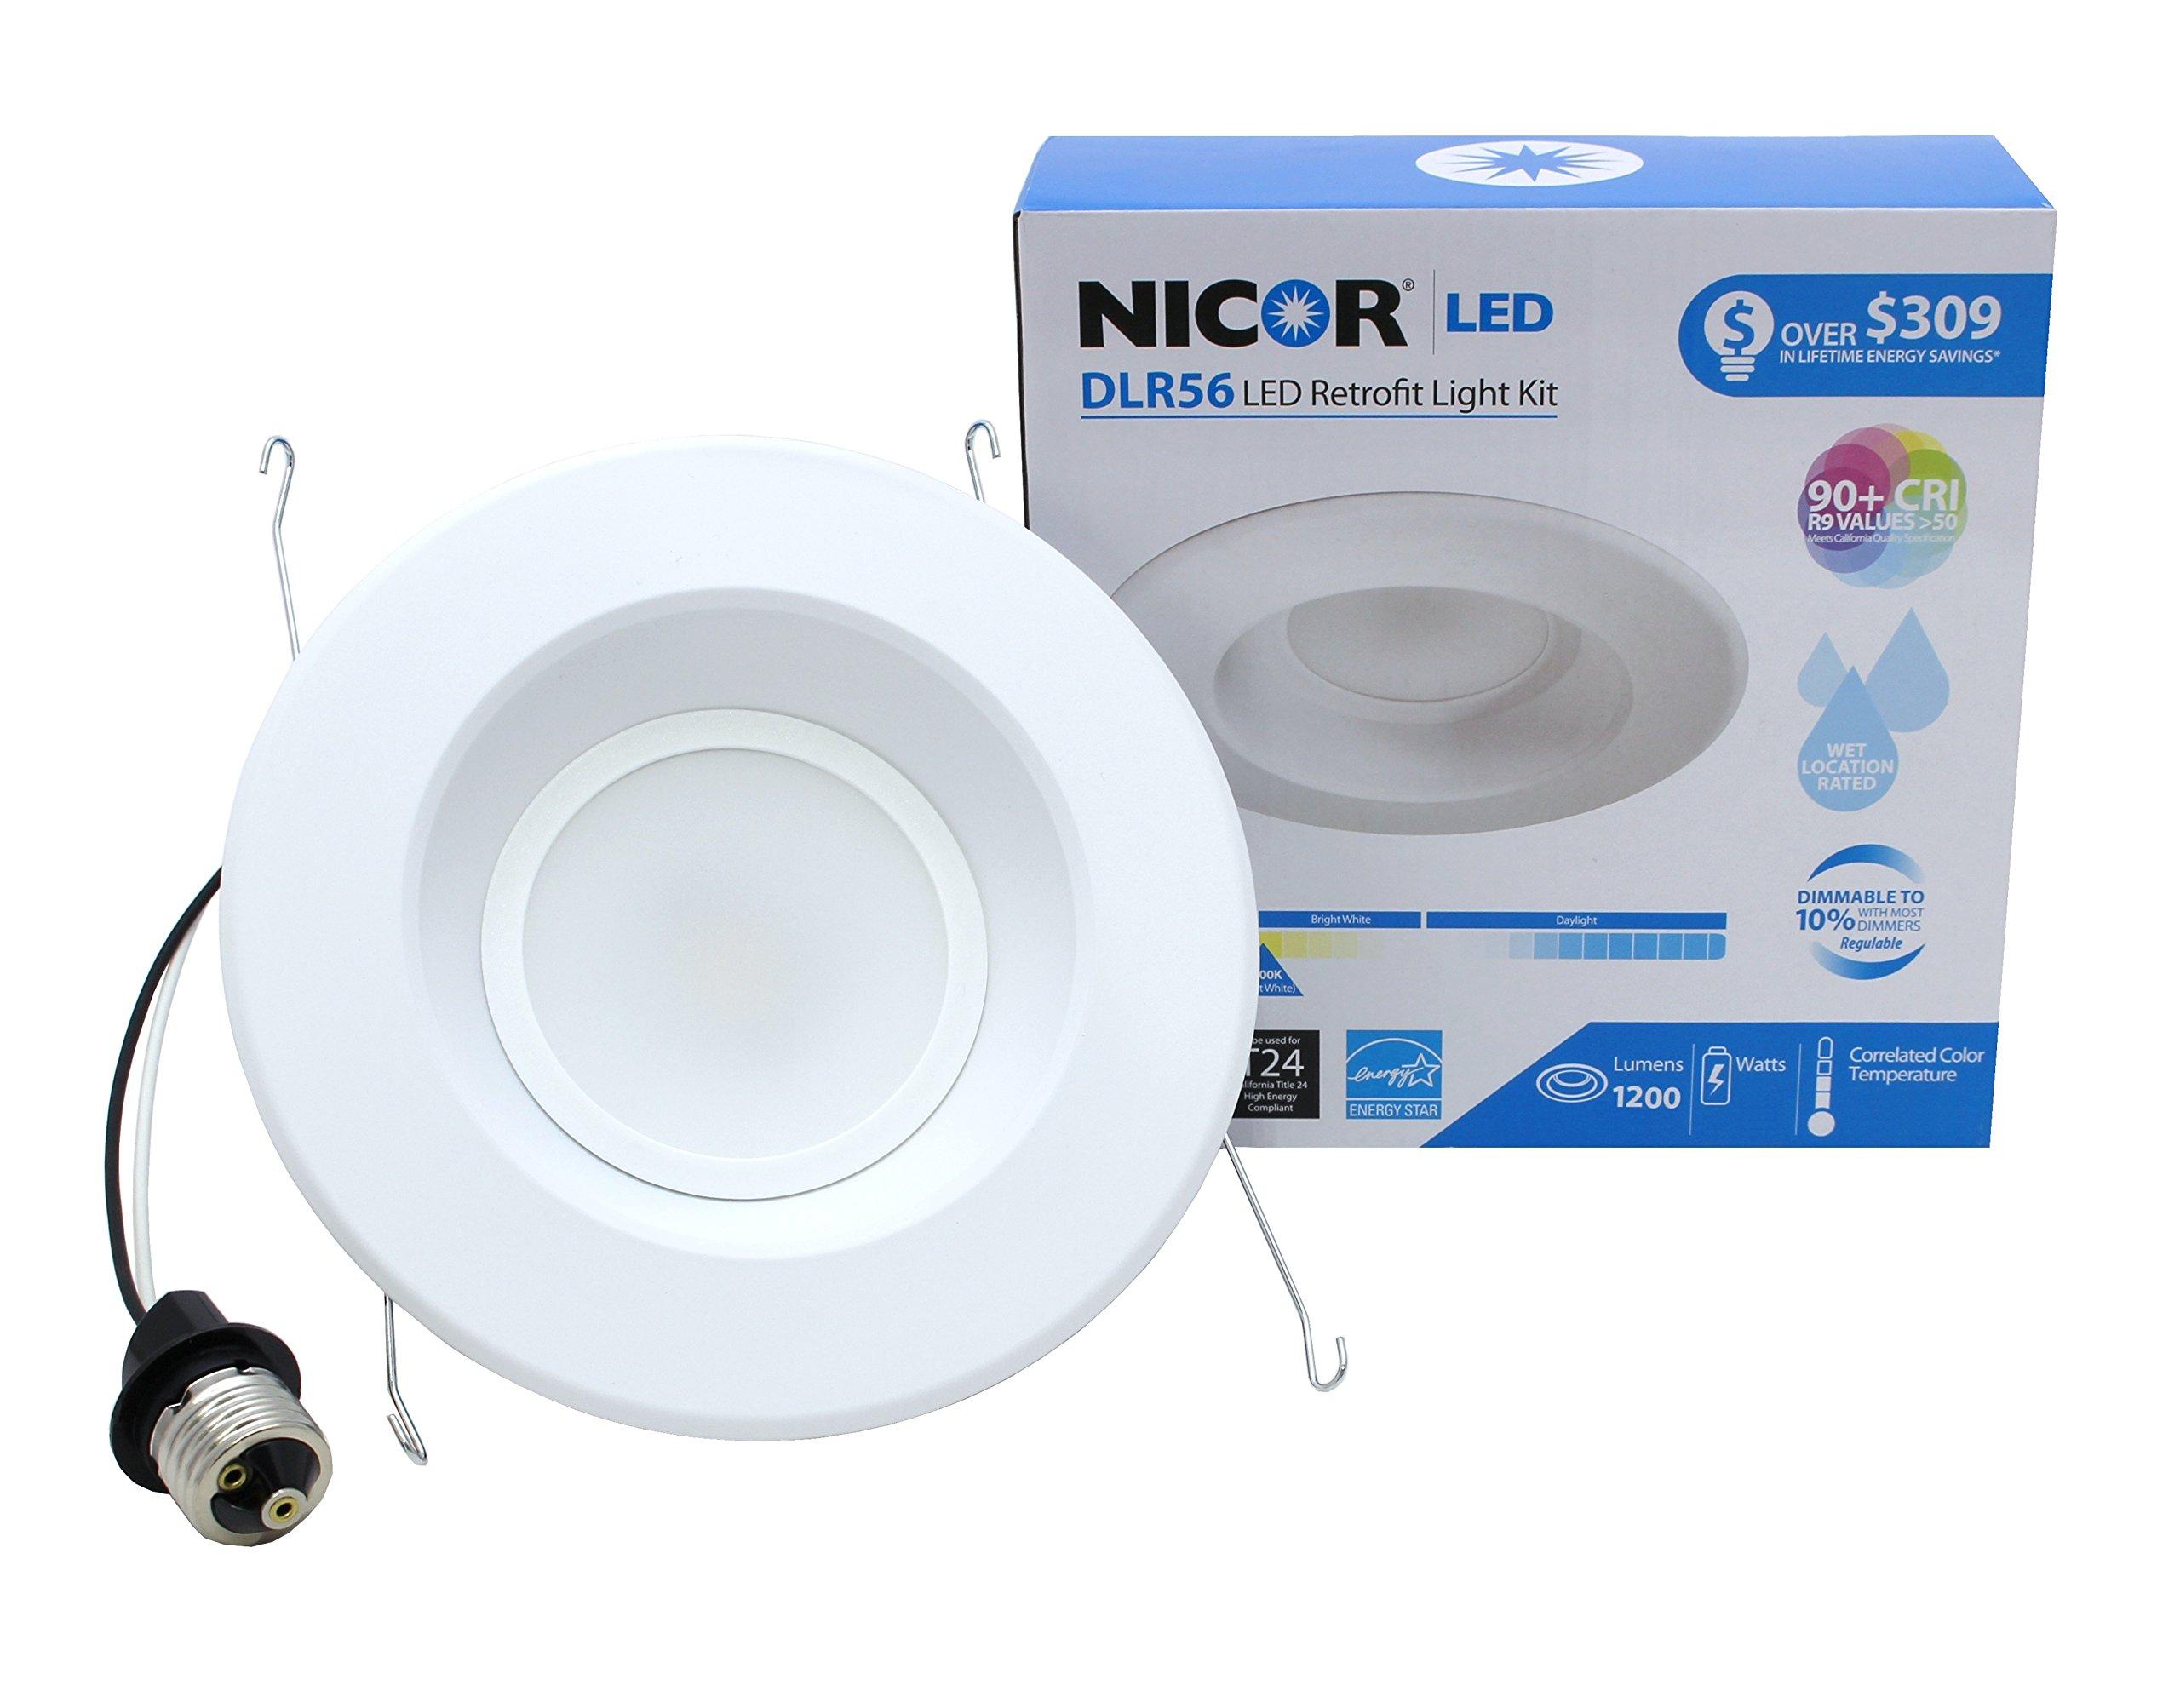 NICOR Lighting 5/6-Inch Dimmable 1200-Lumen 2700K LED Downlight Retrofit Kit for Recessed Housings, White Trim (DLR56-3012-120-2K-WH)